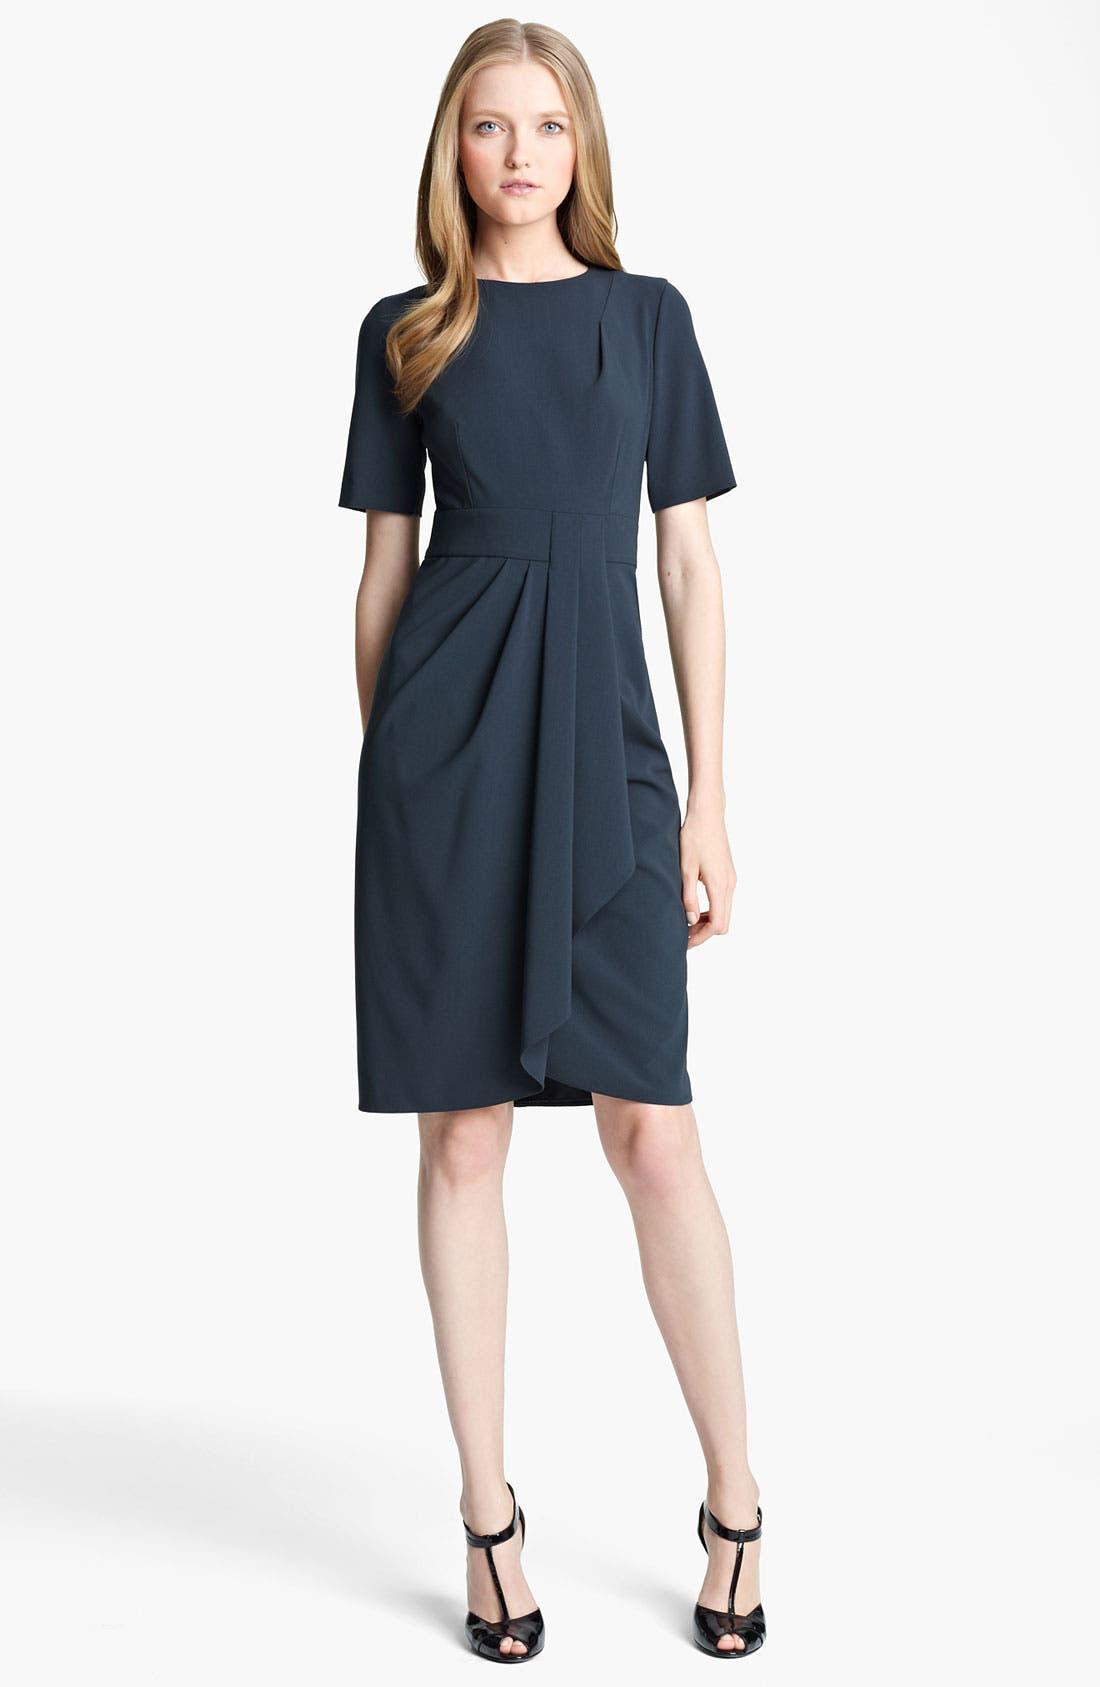 Alternate Image 1 Selected - Armani Collezioni Drape Front Crepe Dress